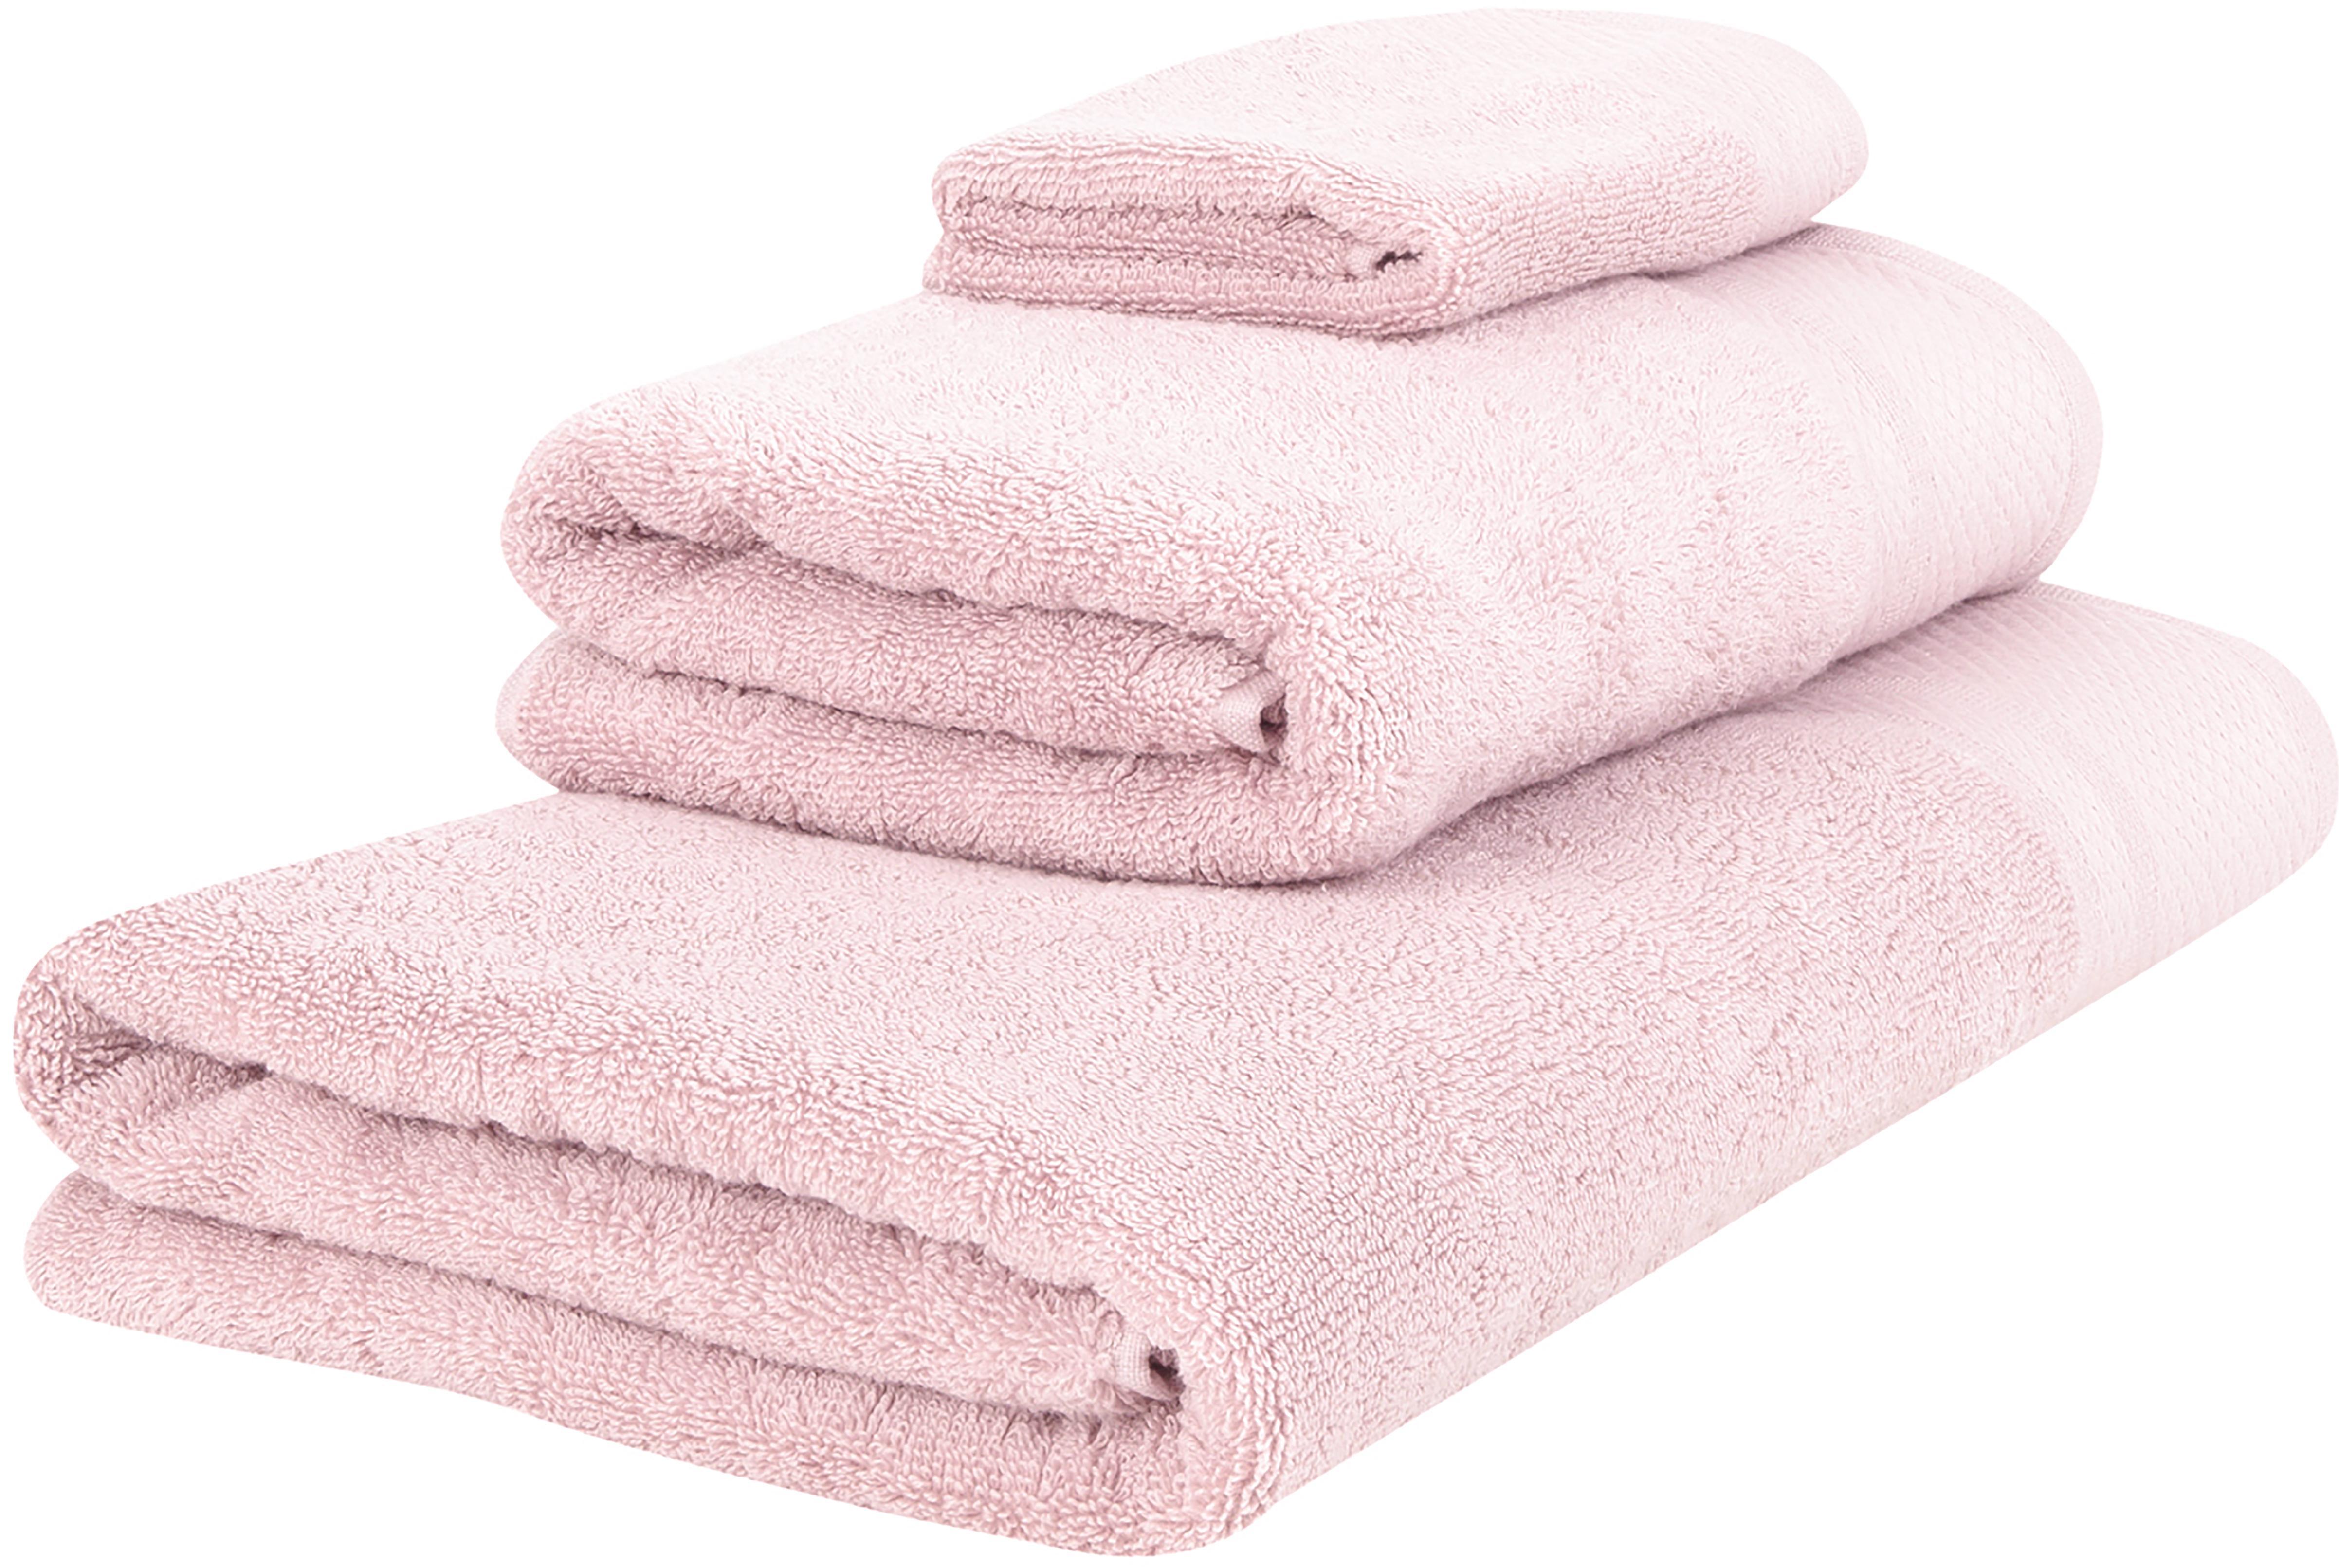 Set de toallas Premium, 3pzas., 100%algodón Gramaje superior 600g/m², Rosa palo, Tamaños diferentes